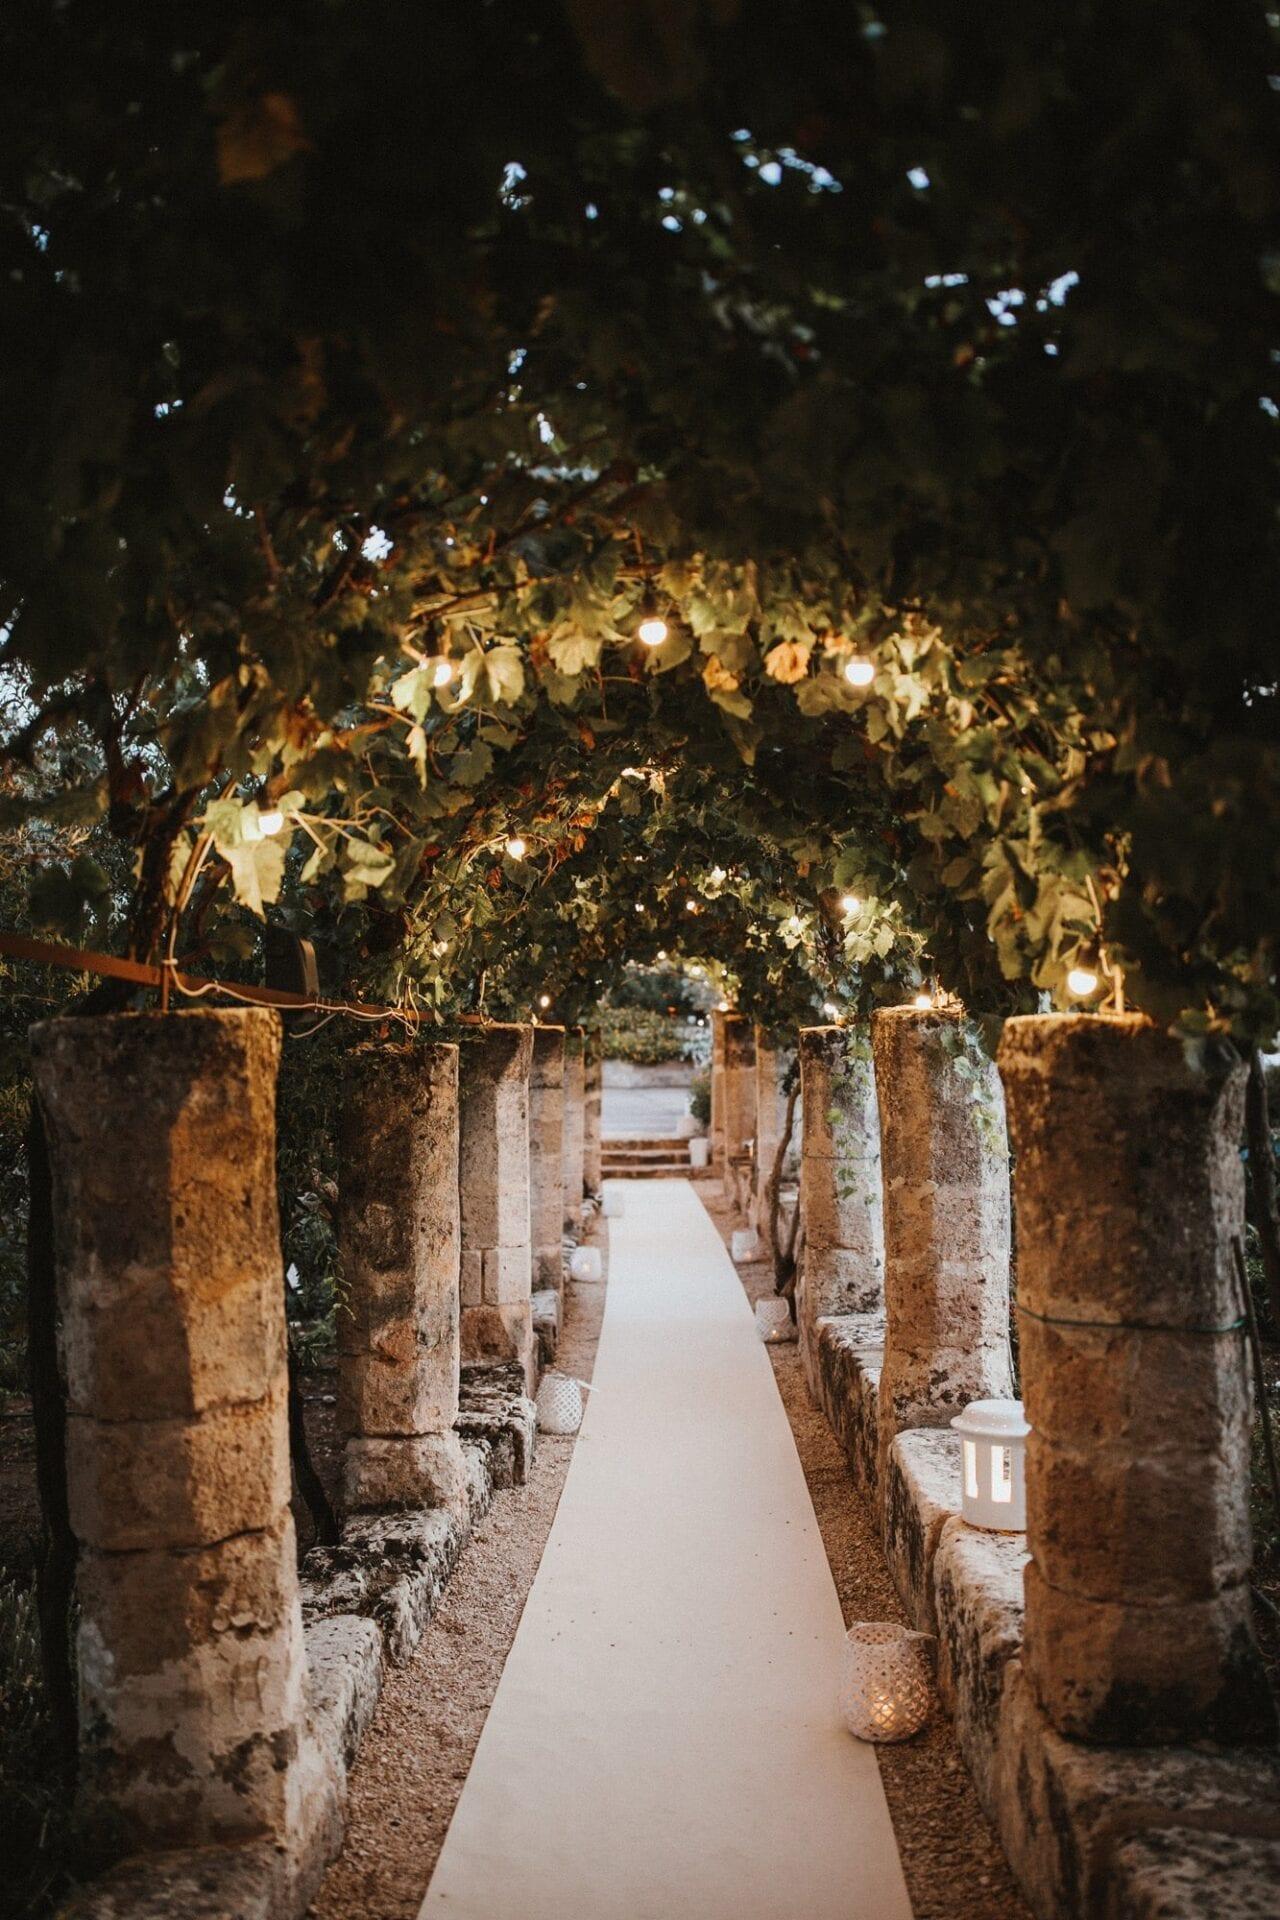 Matrimonio Spiaggia Salento : Matrimonio a masseria torre coccaro bianco bouquet